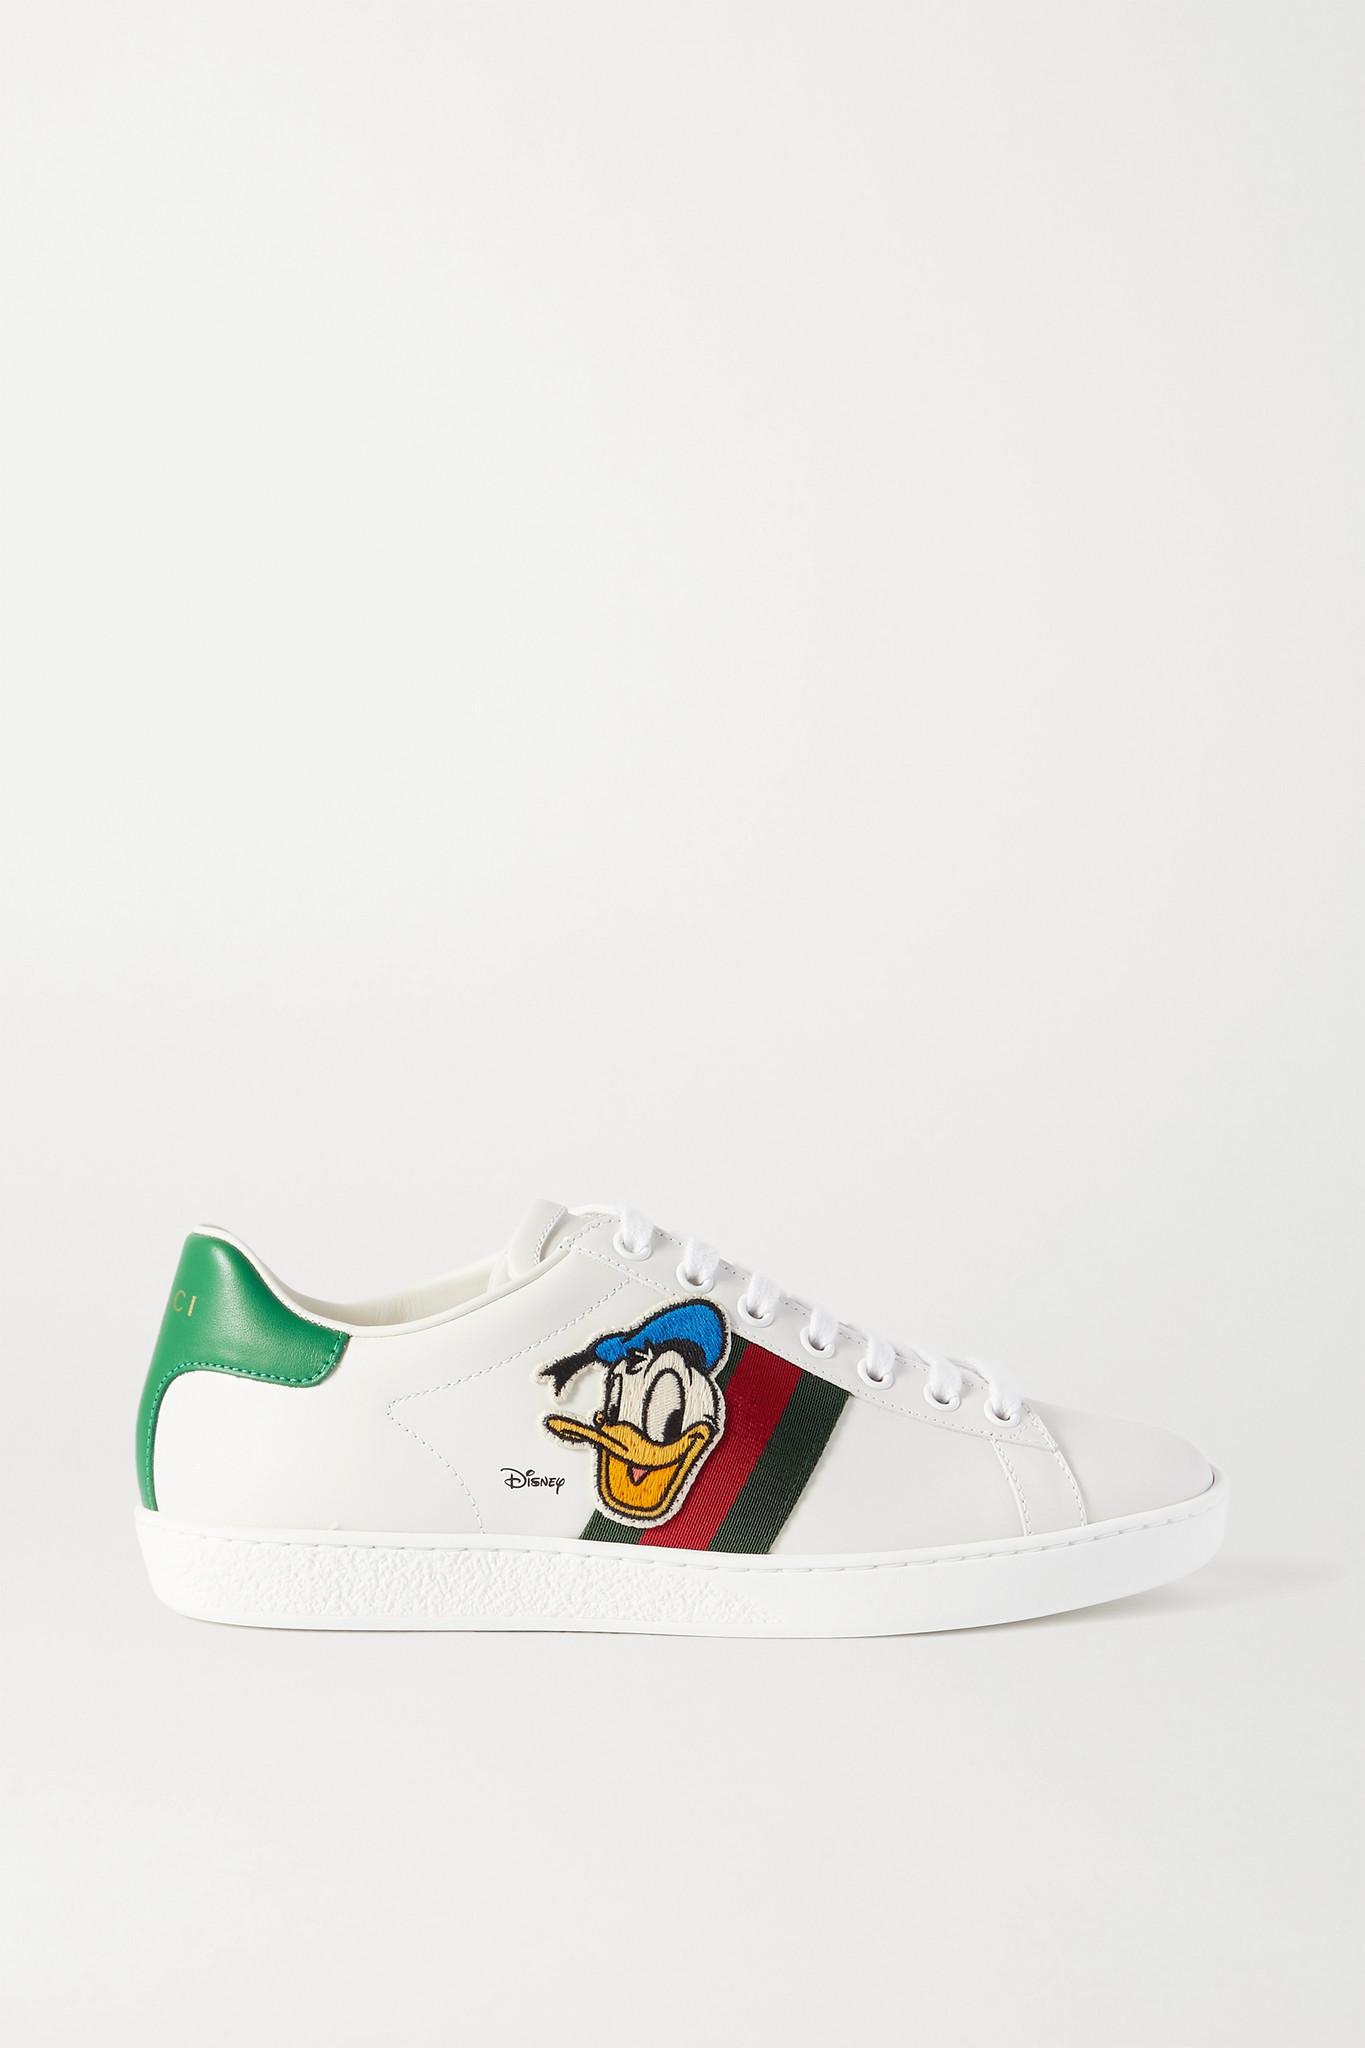 GUCCI - + Disney Ace Appliquéd Canvas-trimmed Leather Sneakers - White - IT39